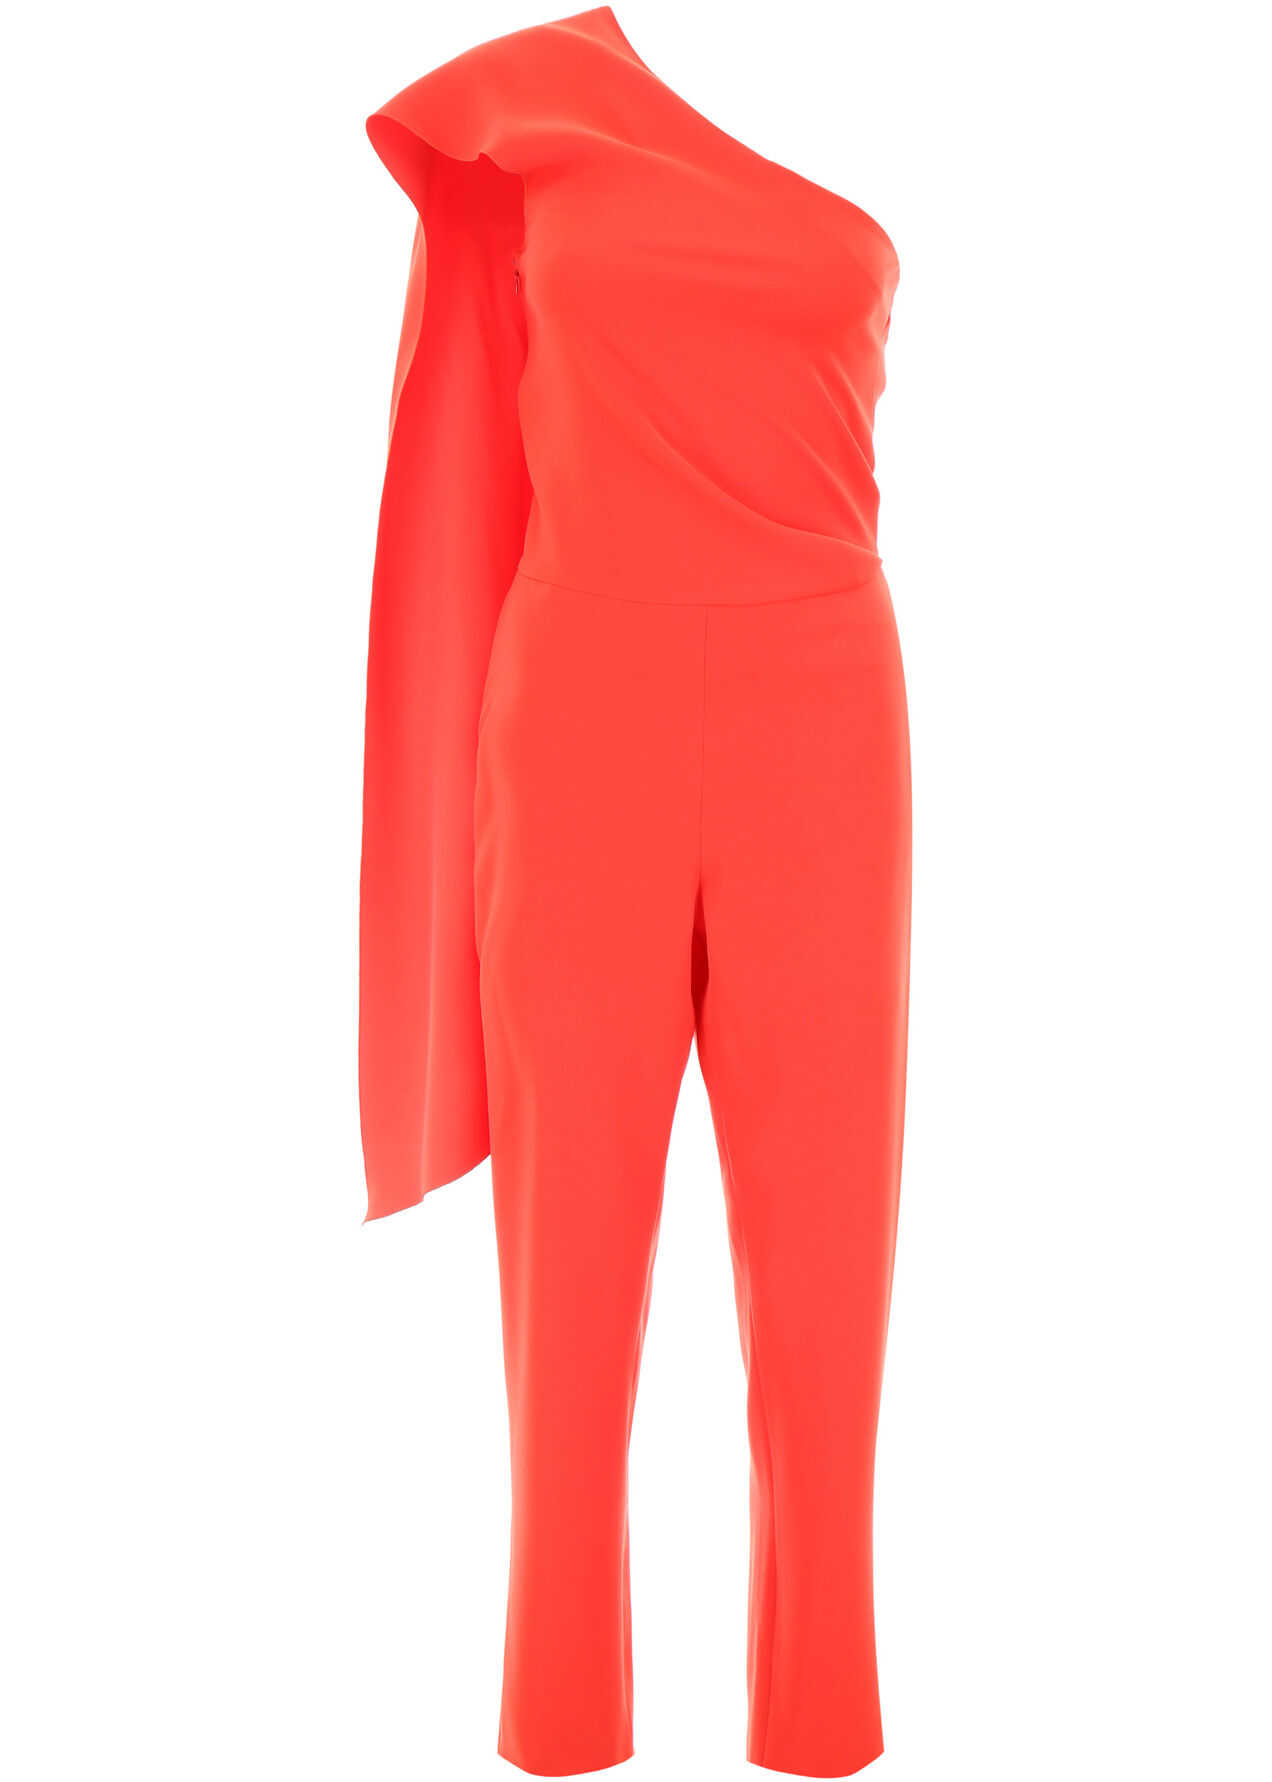 Lanvin Scarf Jumpsuit POPPY RED